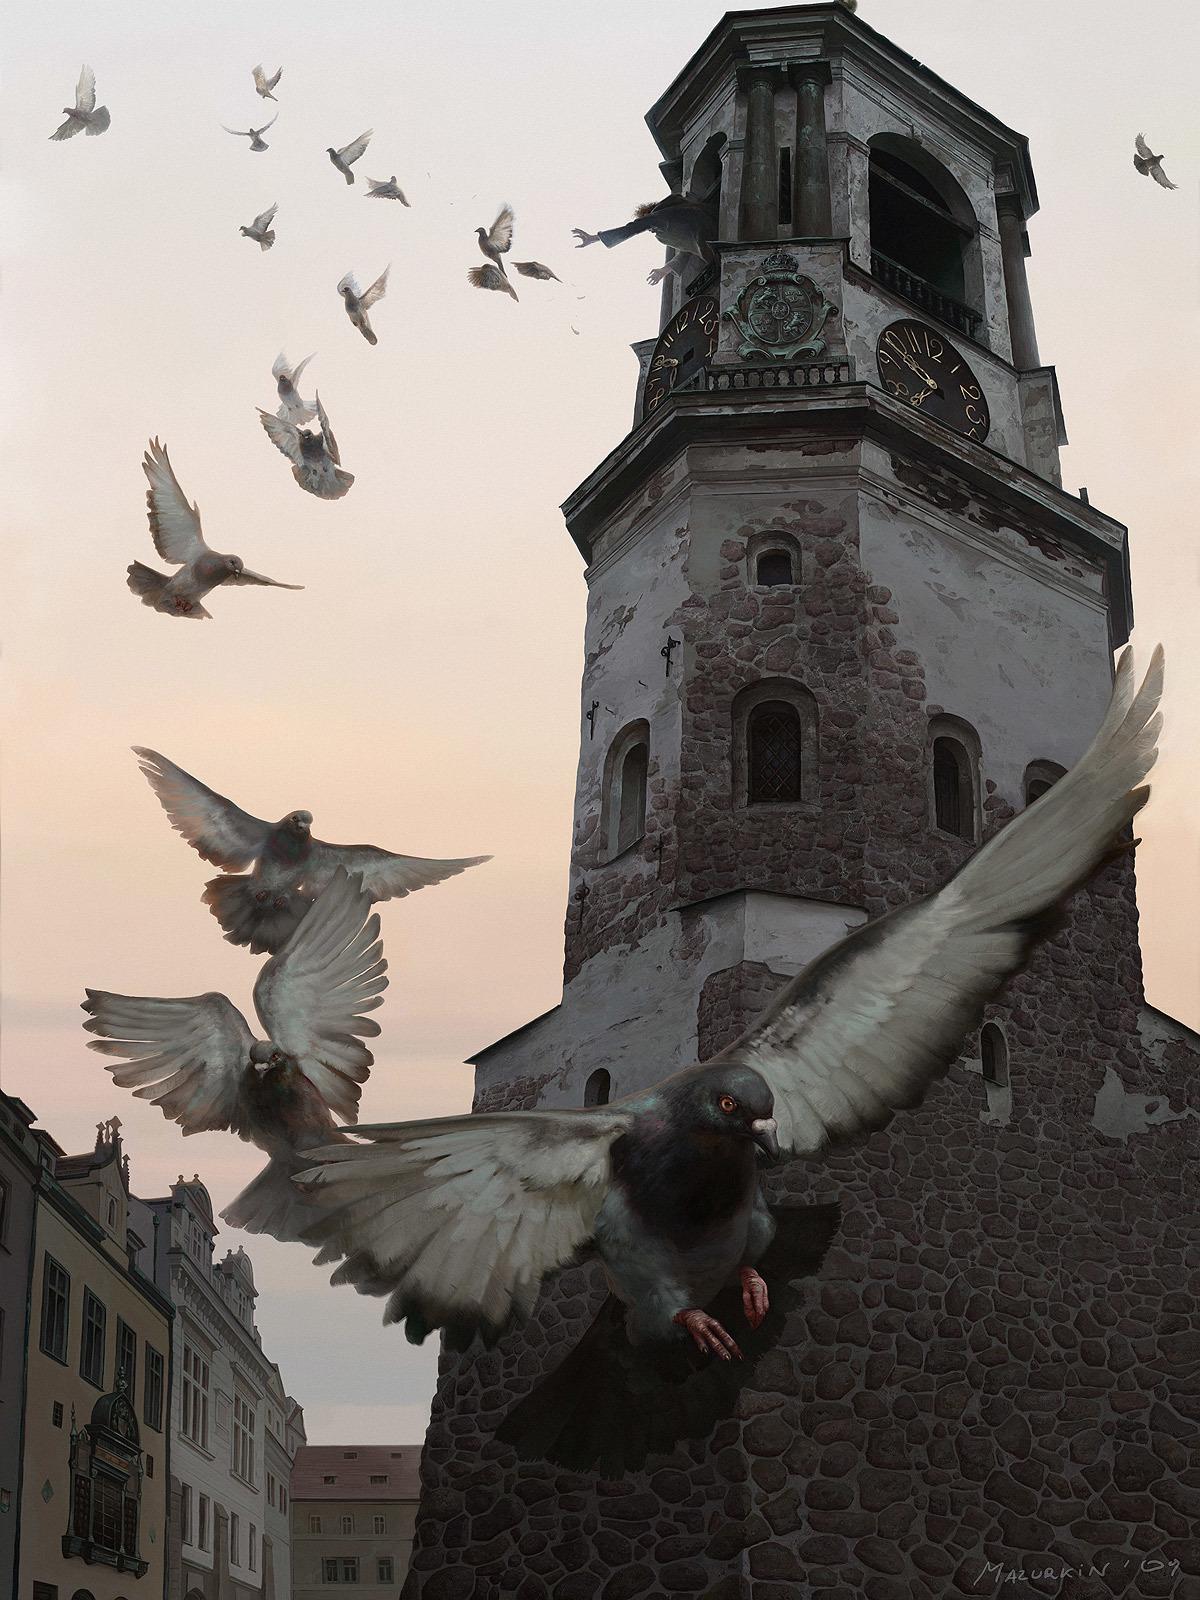 Mazurkin clock tower 1 82a3ffa6 fji8